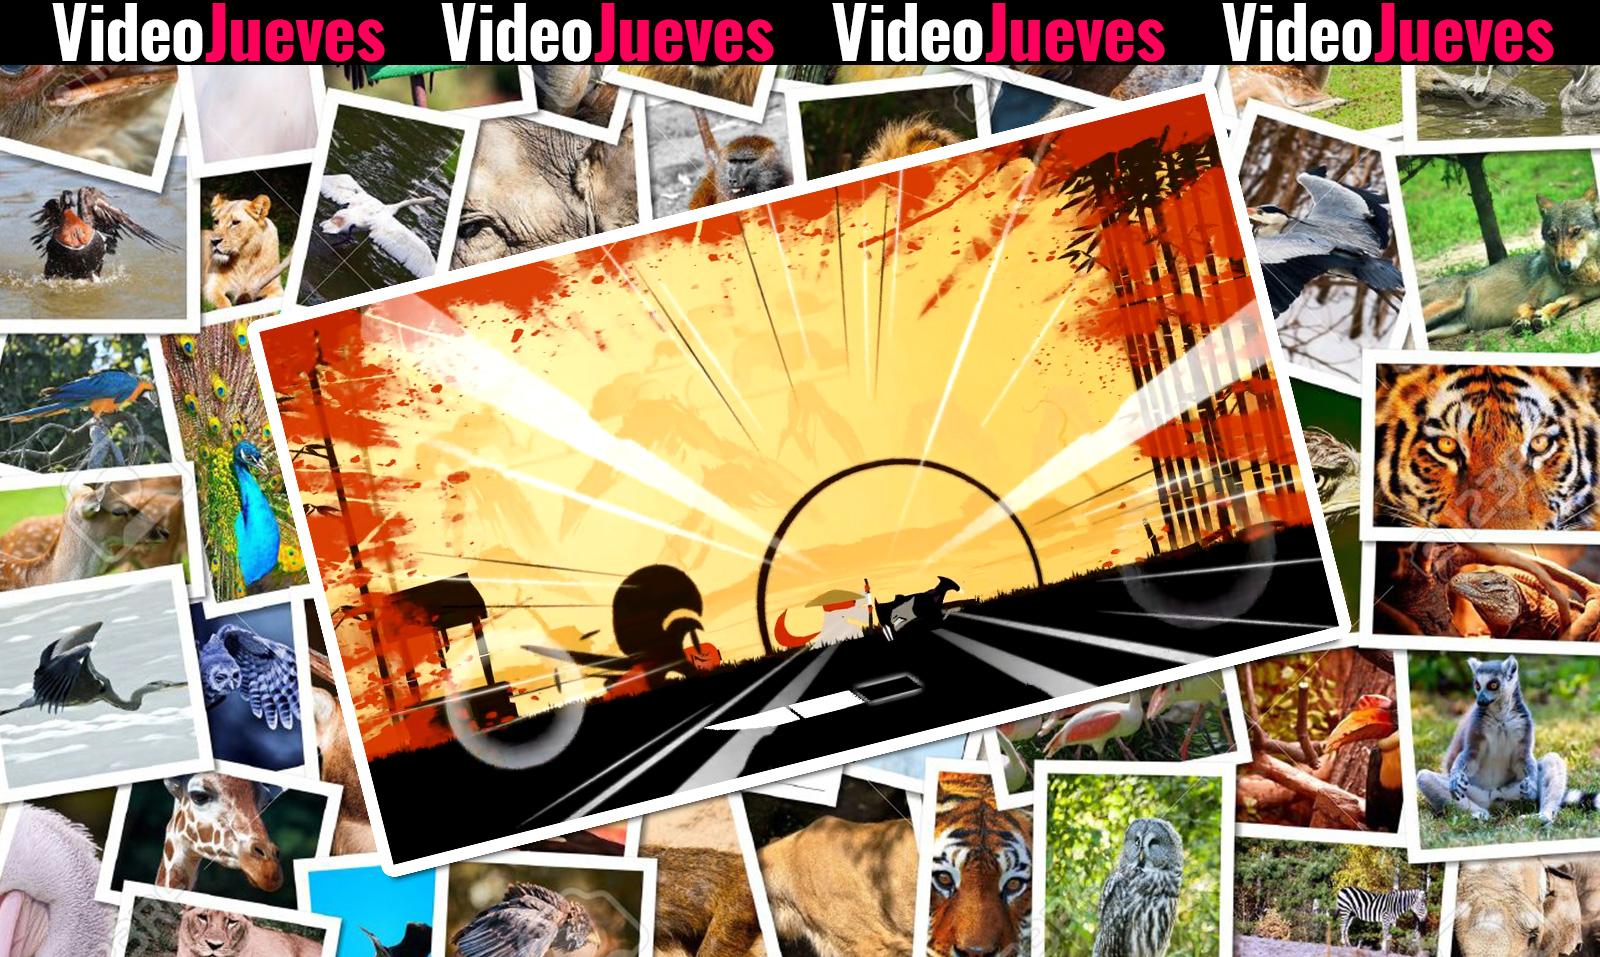 Samurai Bamboo Videojueves